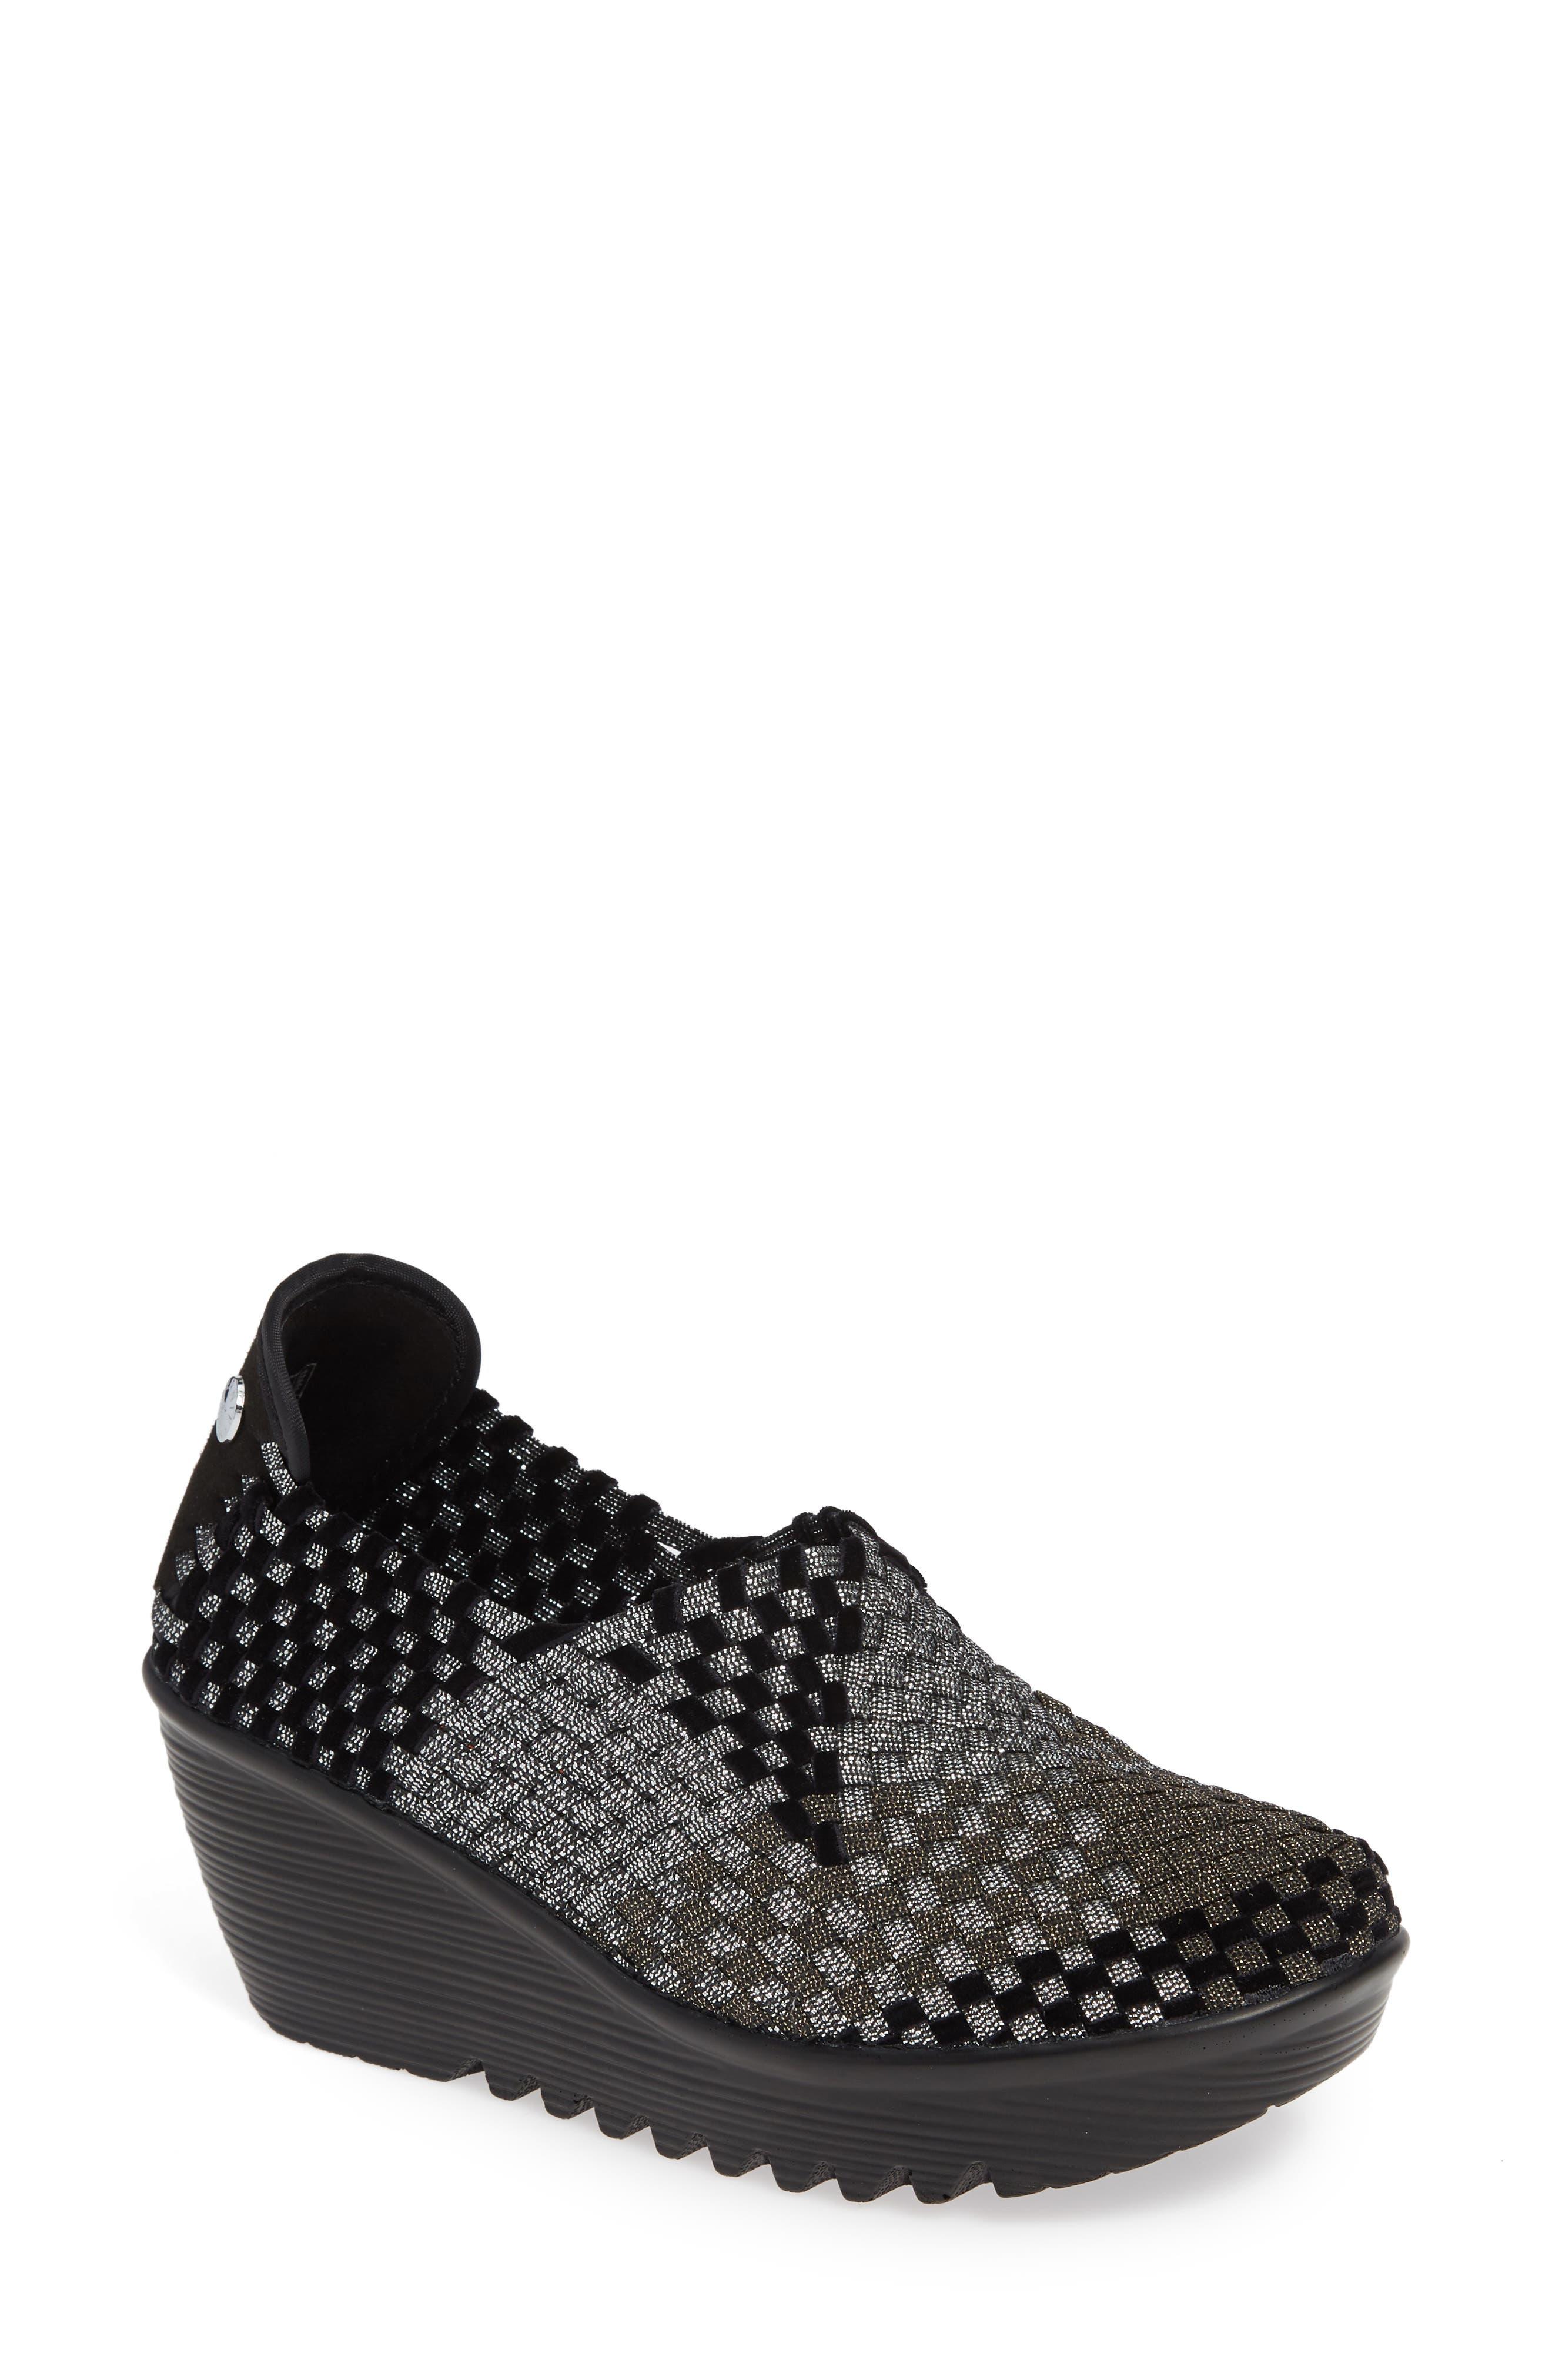 03f9e5b775b bernie mev. Women s Shoes